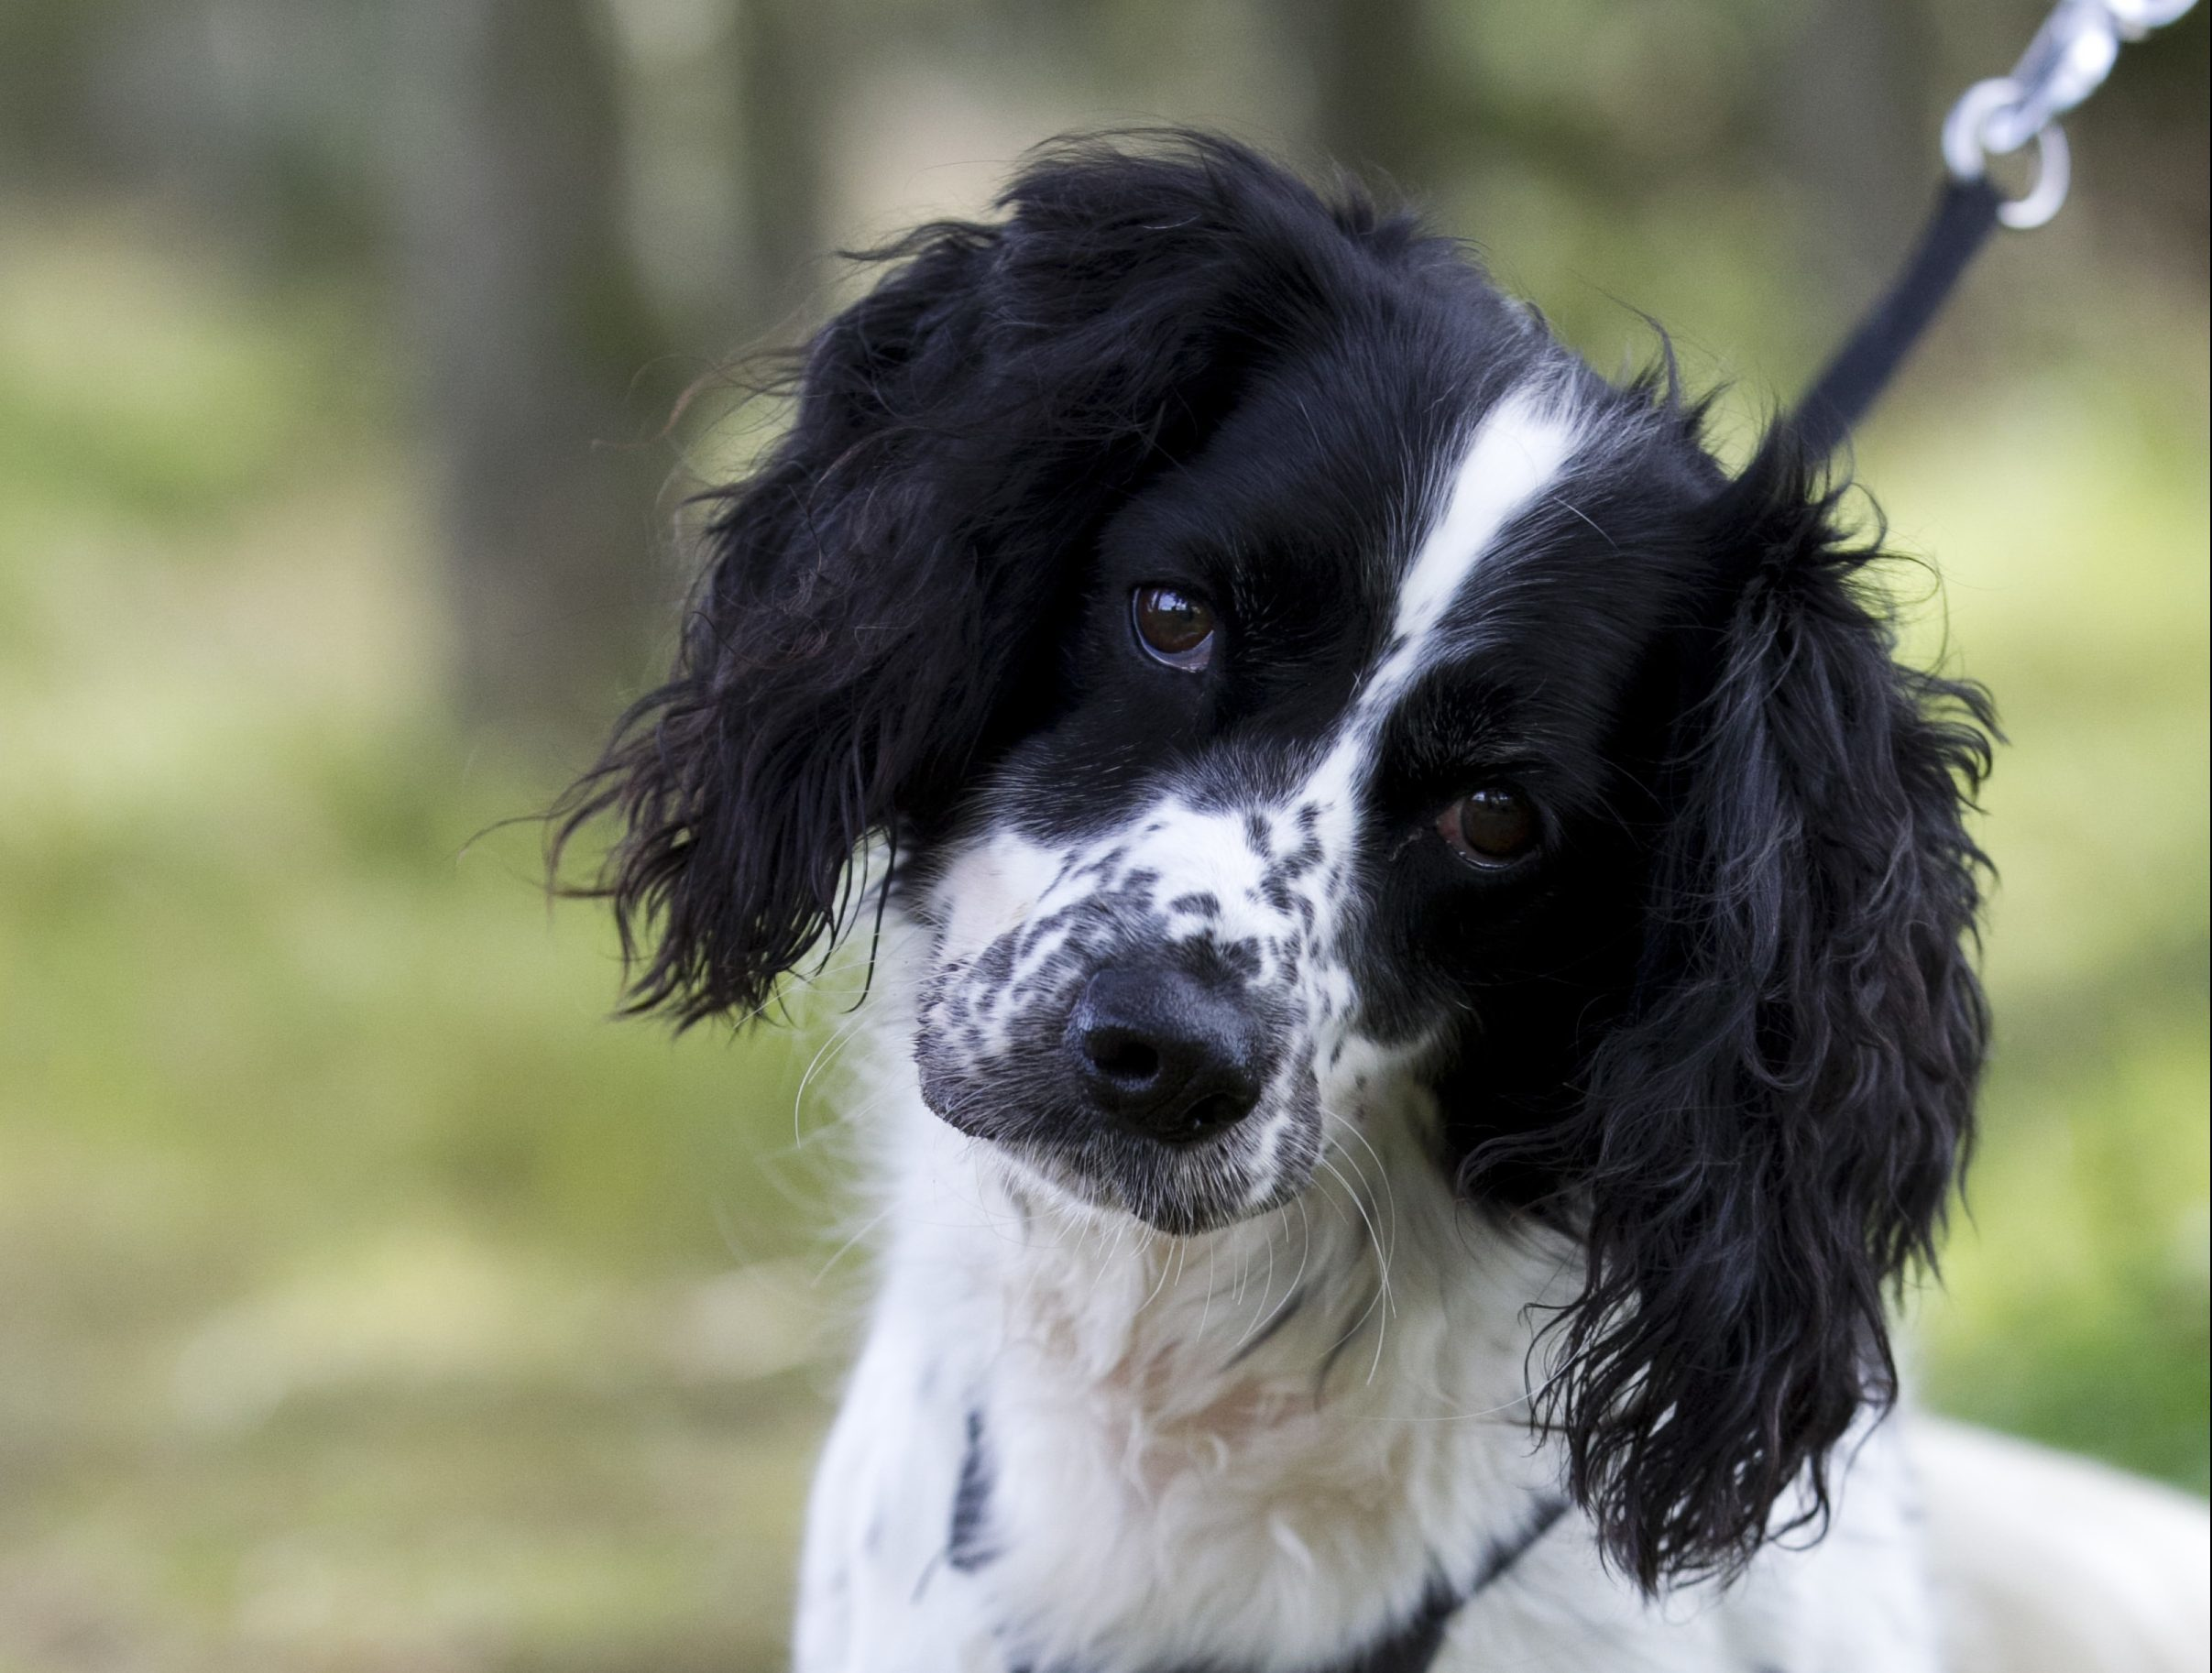 Flo the dog (Andrew Cawley, DC Thomson)